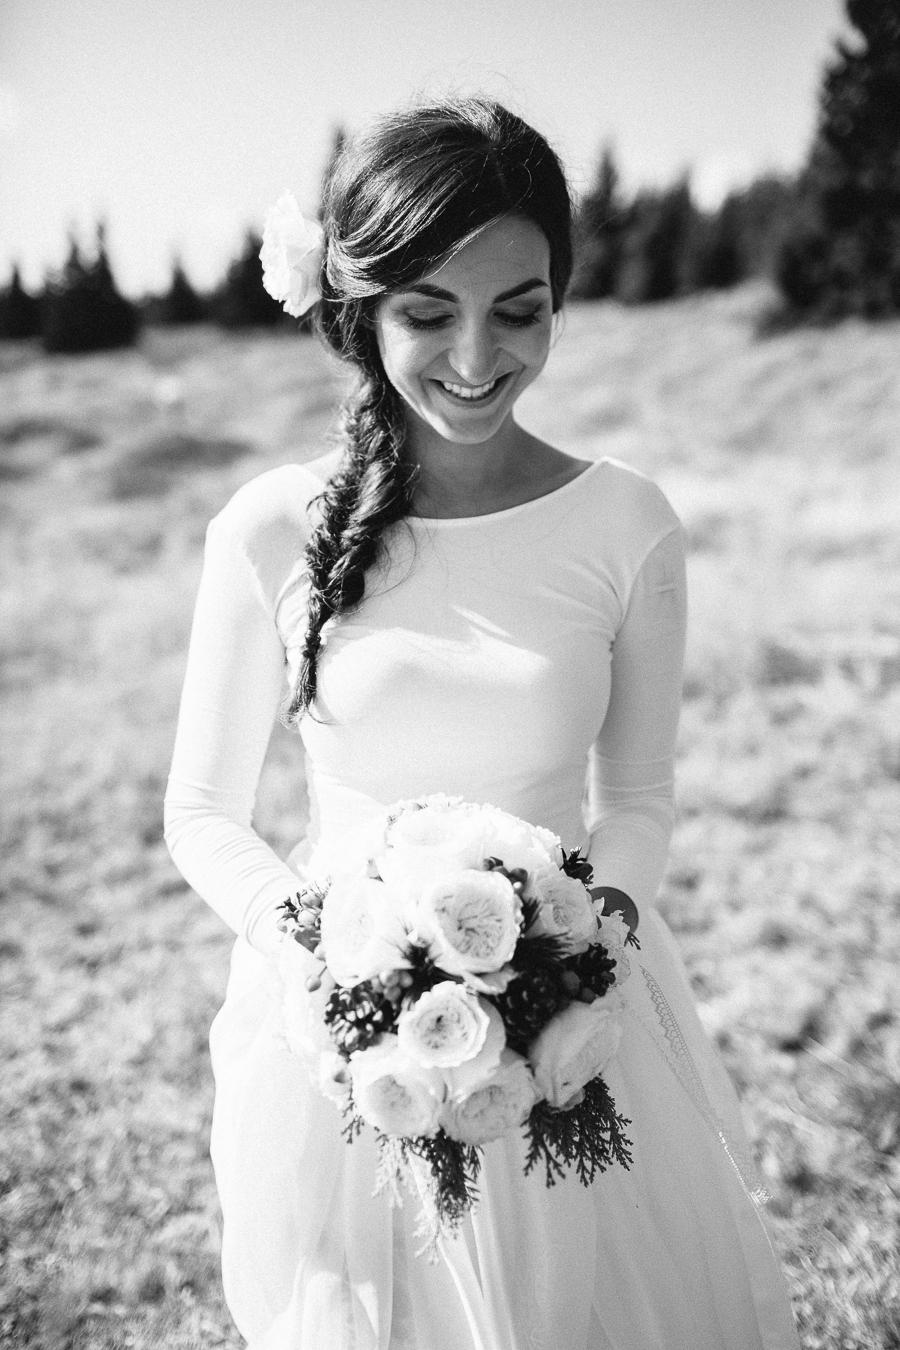 105-everbay-wedding-photography-IMG_7905.jpg